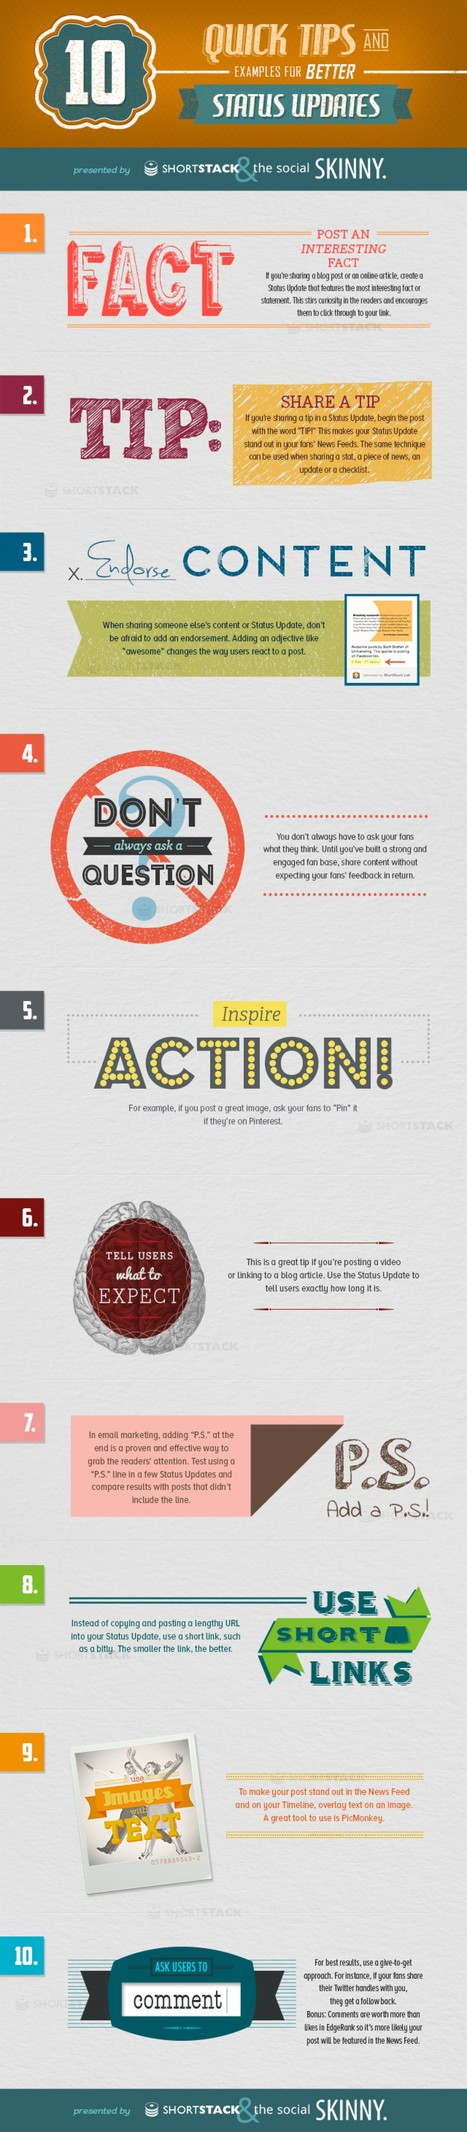 How to improve social media updates? |  Techinfographics.com | #TheMarketingAutomationAlert | Digital Marketing | Scoop.it